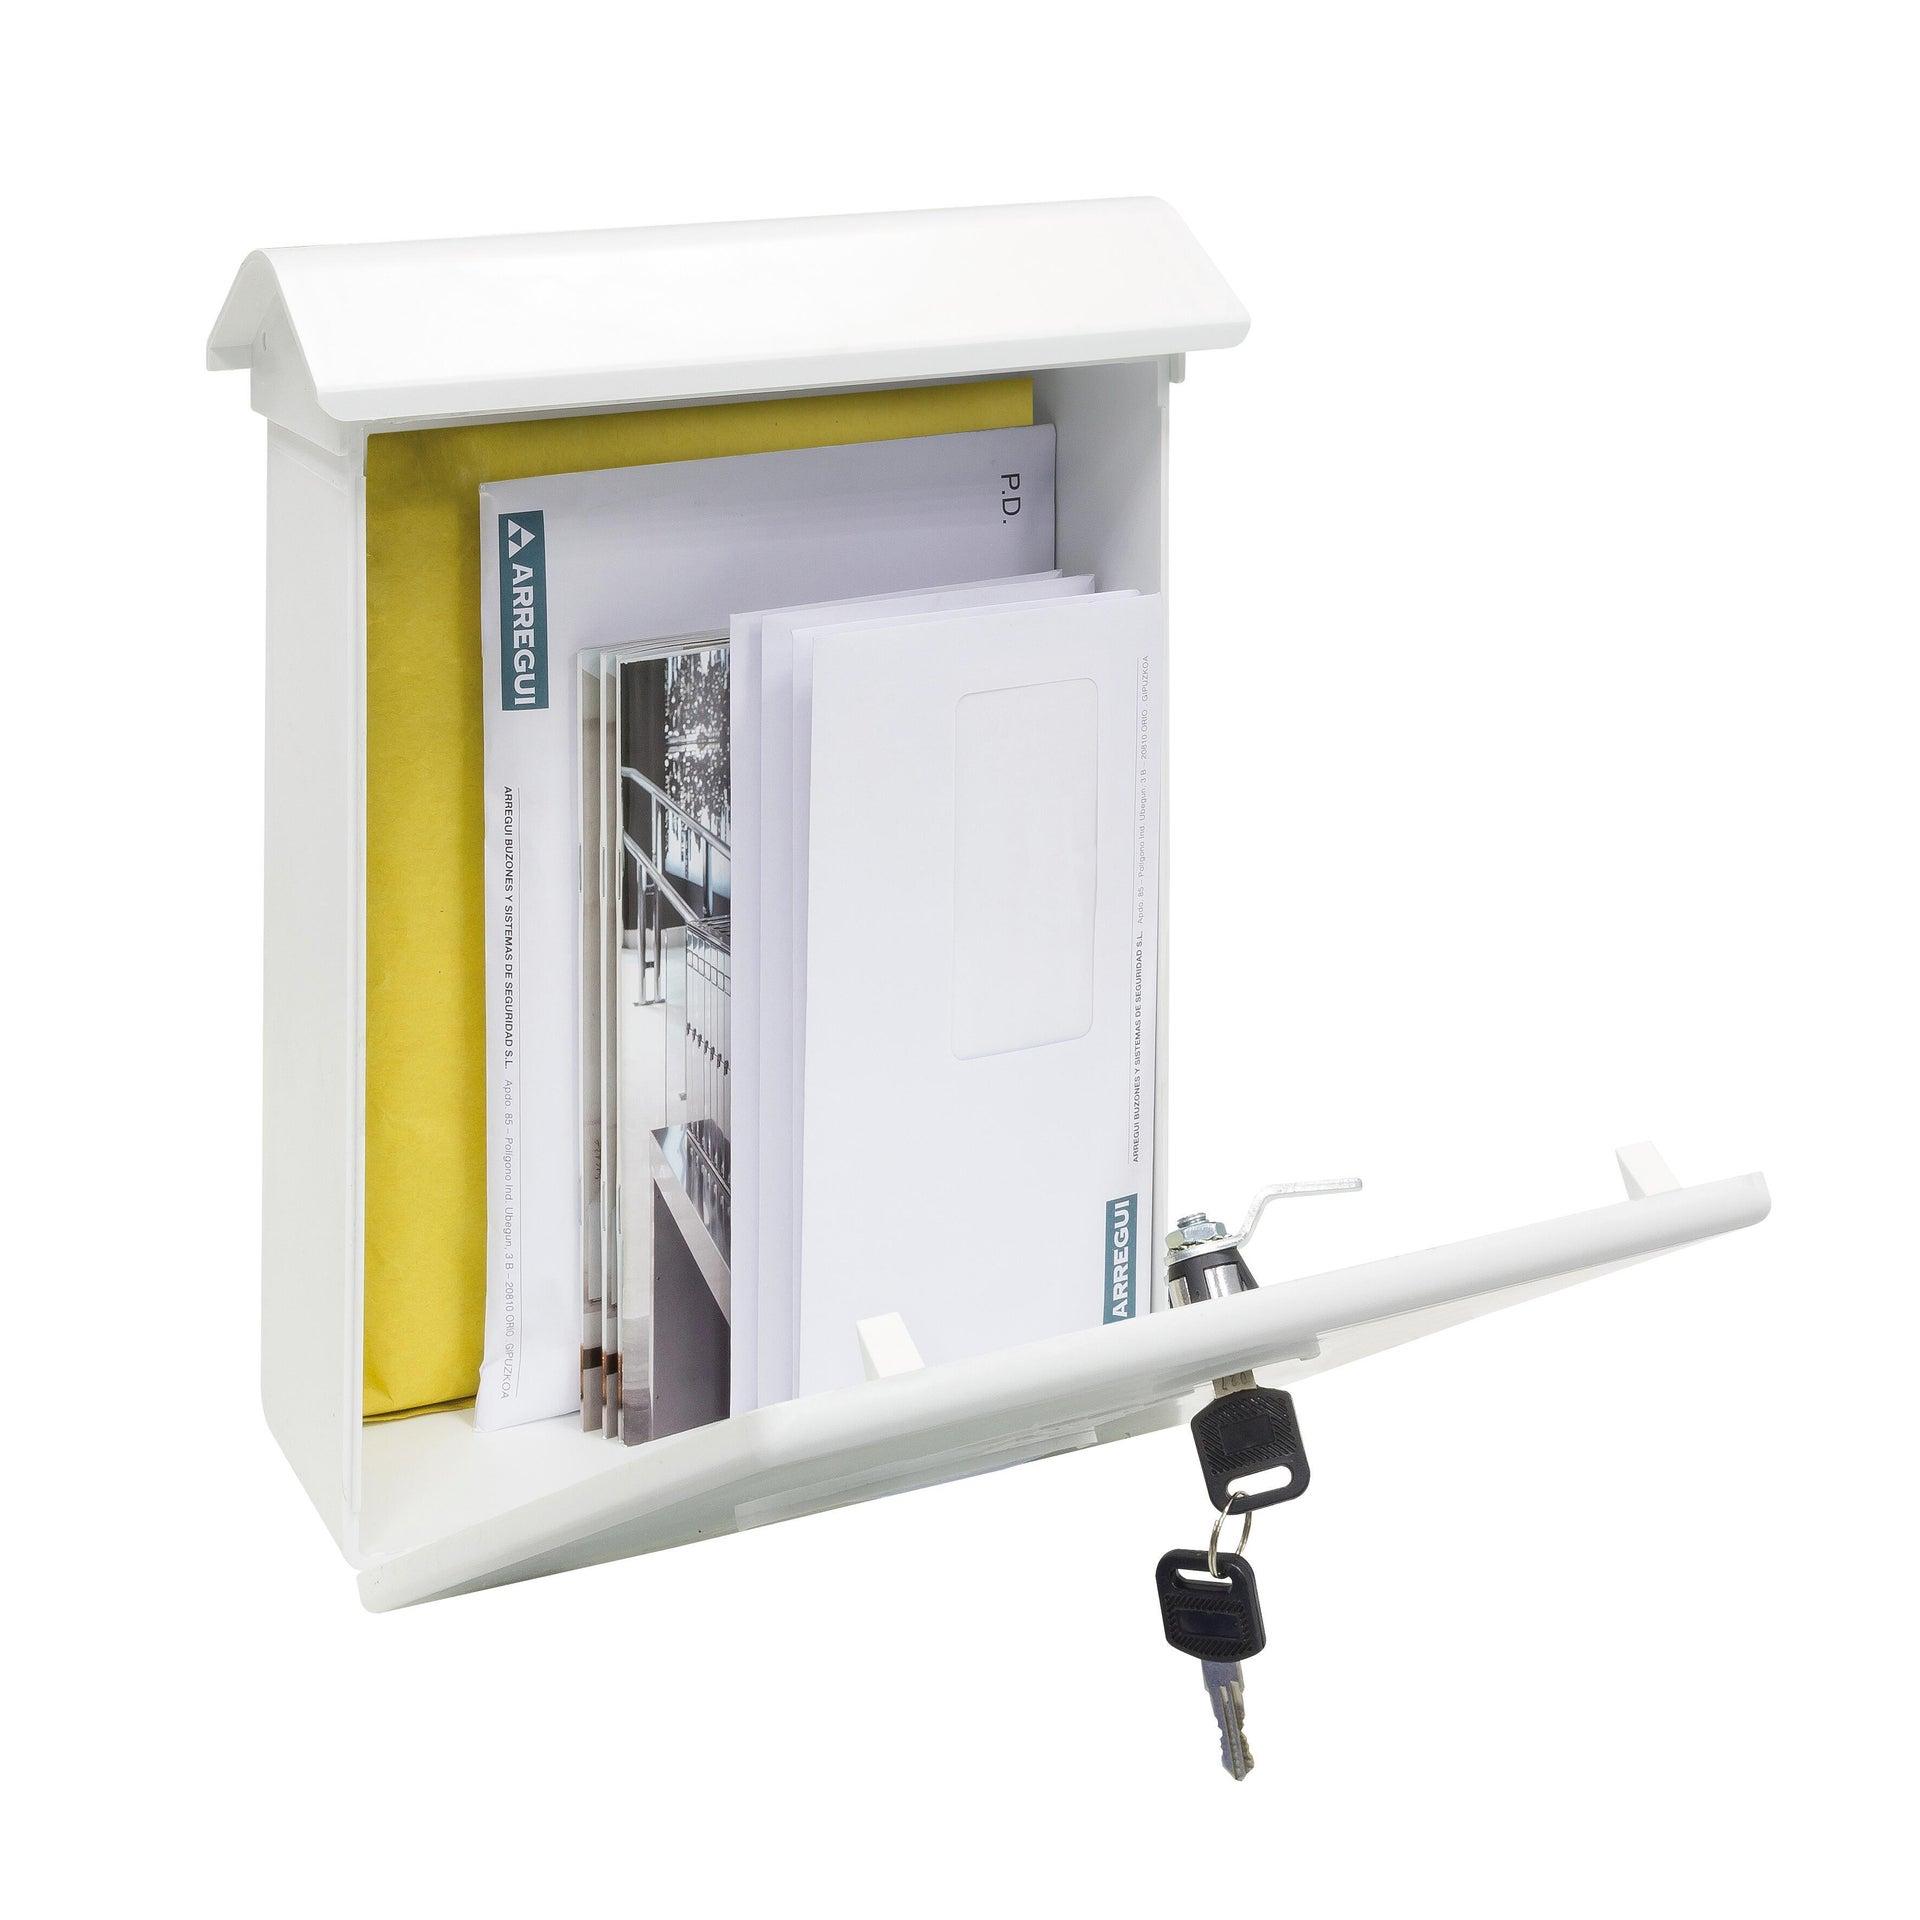 Cassetta postale ARREGUI formato Rivista, bianco , L 27 x P 11 x H 34.6 cm - 3